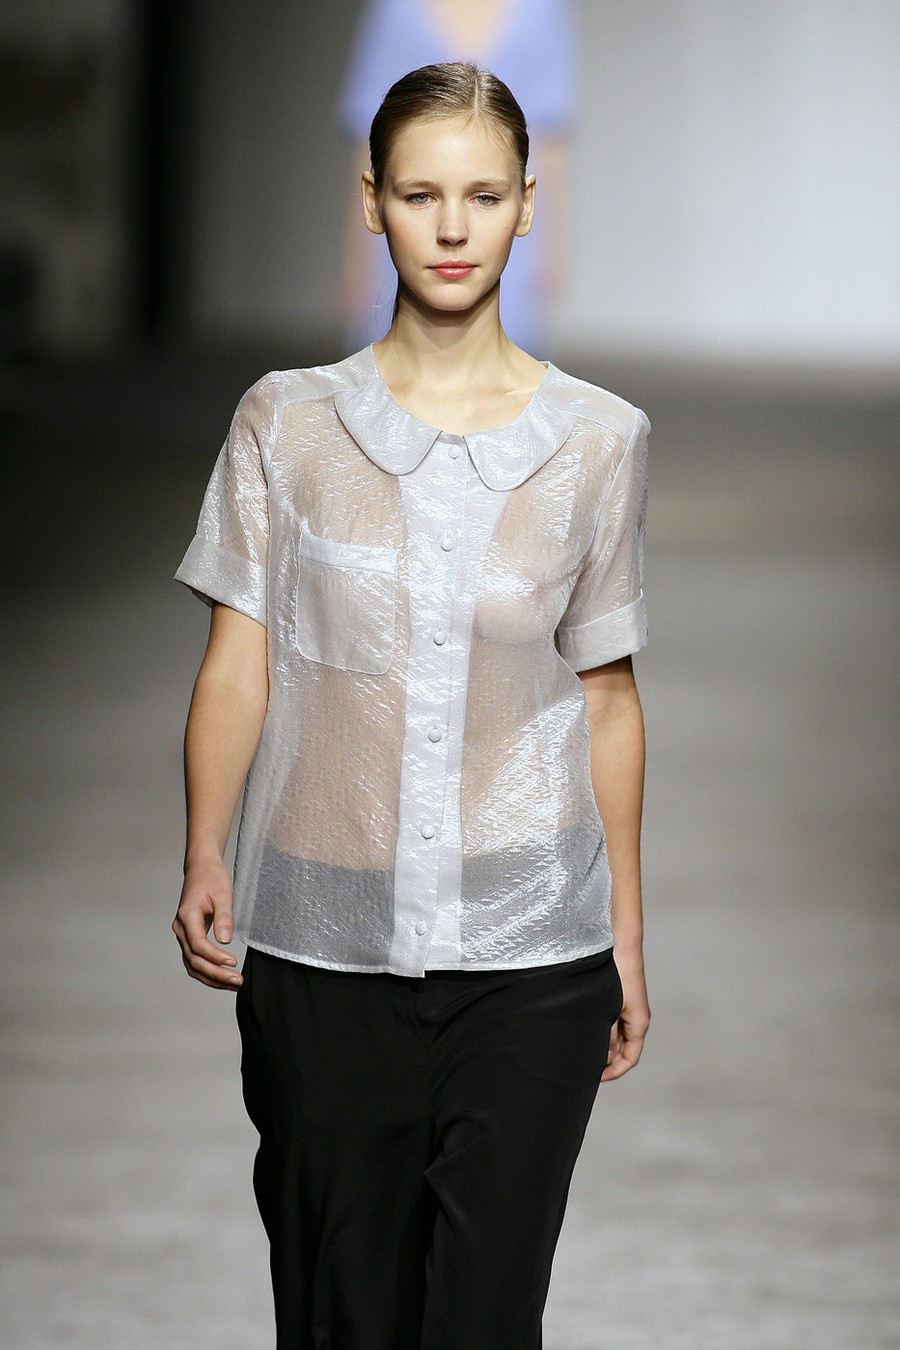 Прозрачная мода